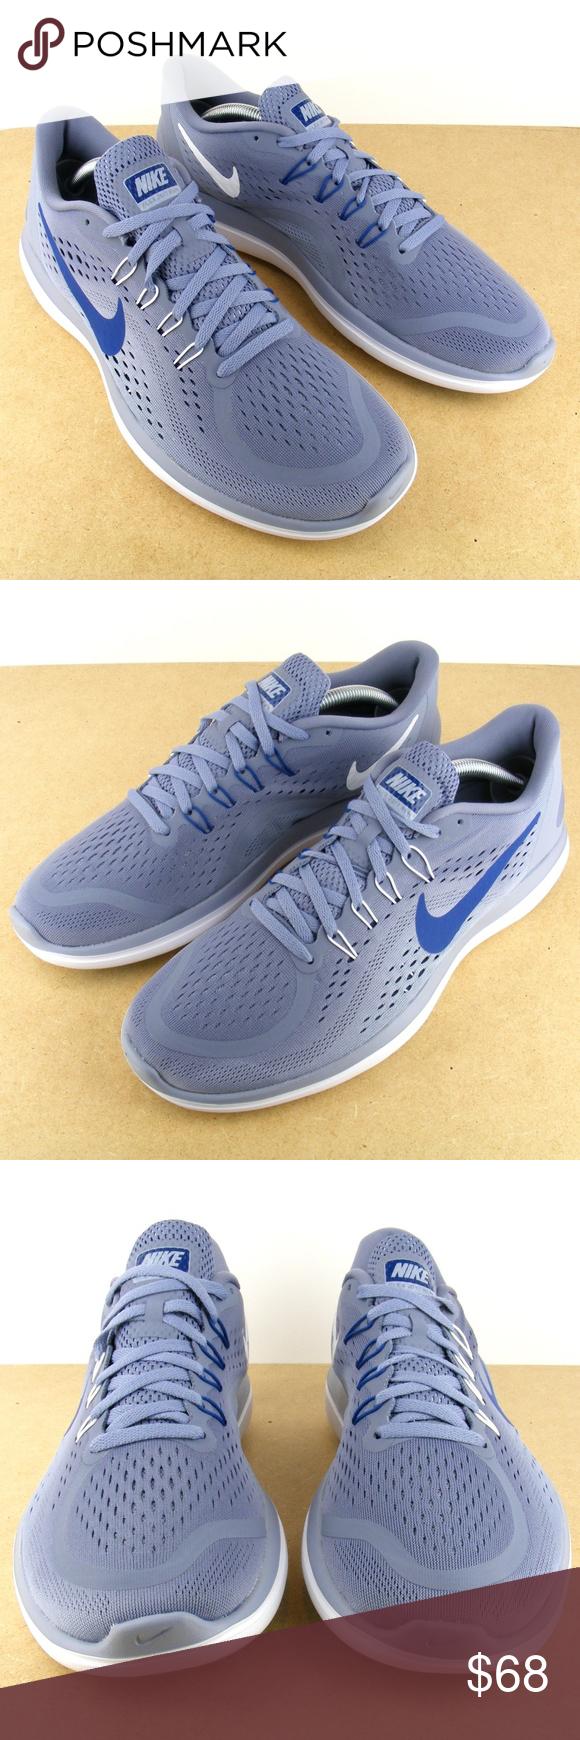 50f35d218de2 Nike Flex 2017 898457 401 Blue Running Shoes 10.5 Nike Flex 2017 RN Running  Sneakers Trainers 898457 401 Dark Sky Blue Mens 10.5 New in box Nike Shoes  ...